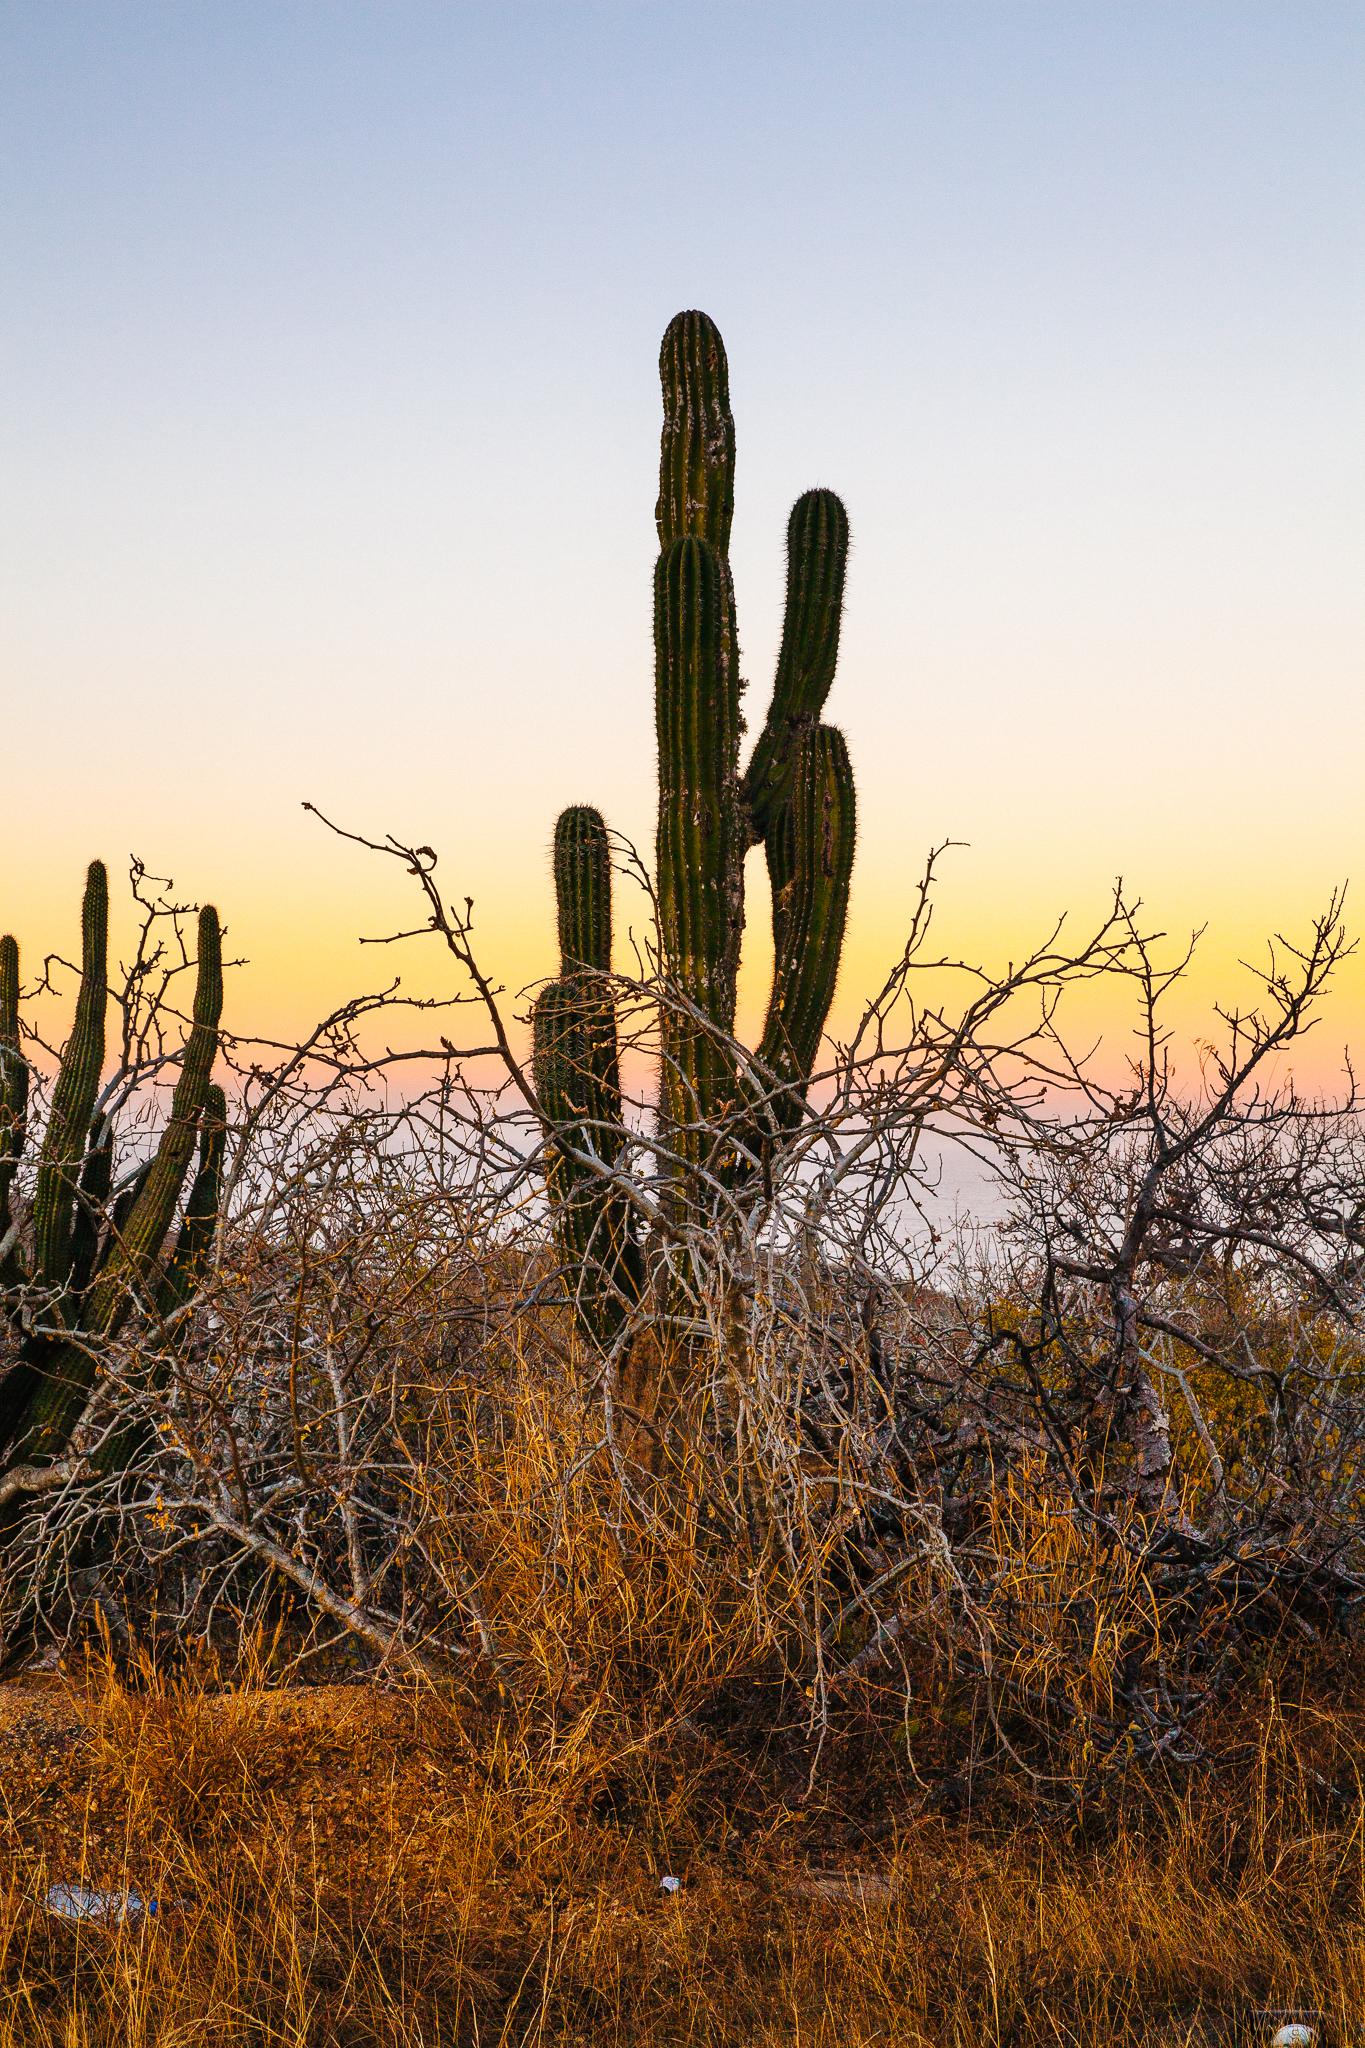 Helynn_Ospina_Travel_Mexico_Baja_Todos_Santos_0155023.jpg